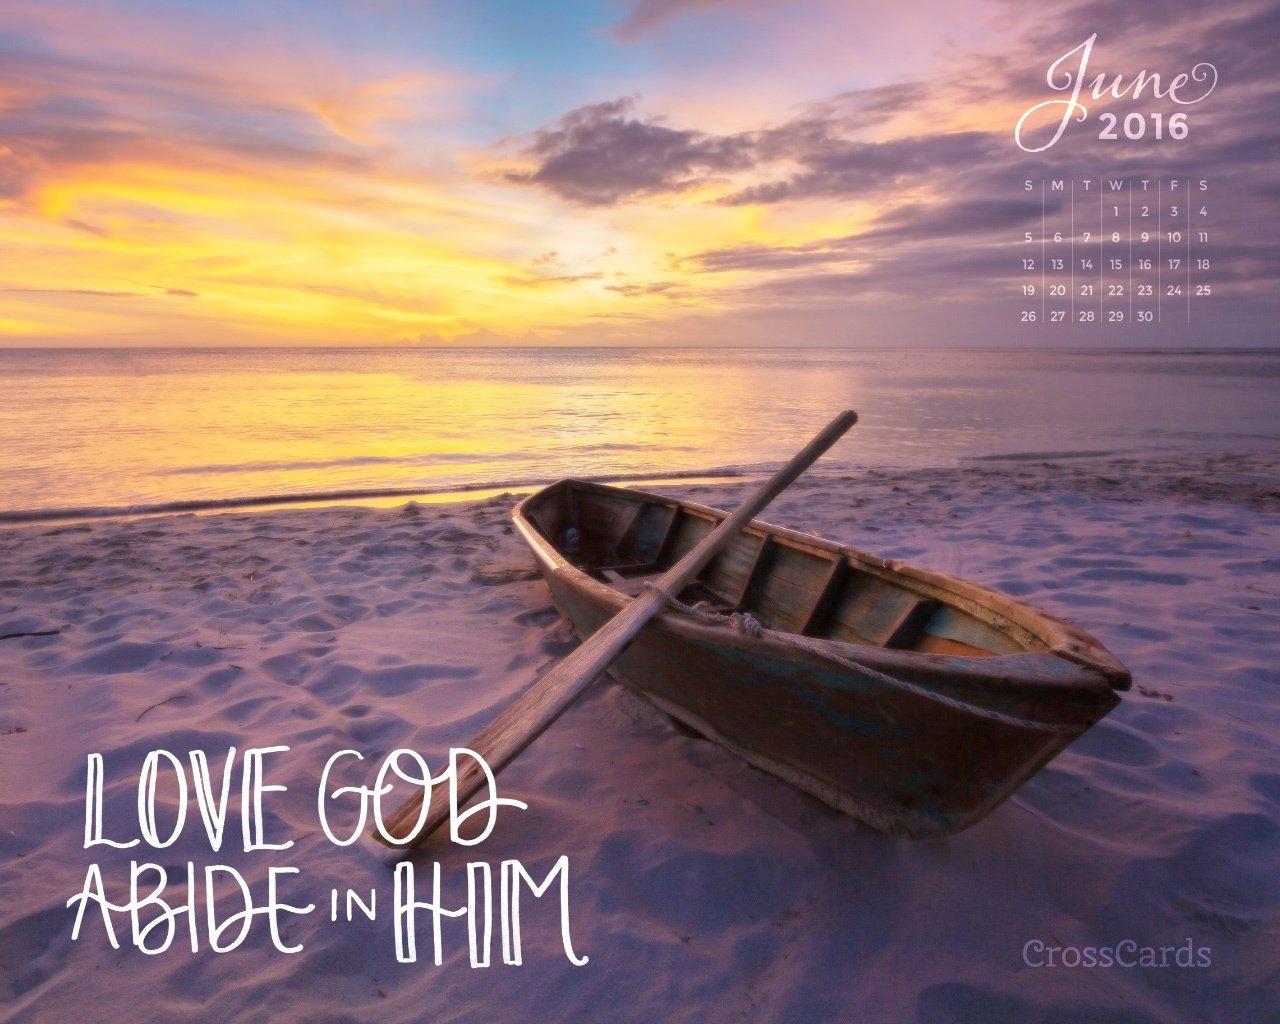 June 2016   Love God Abide in Him Desktop Calendar  Monthly 1280x1024